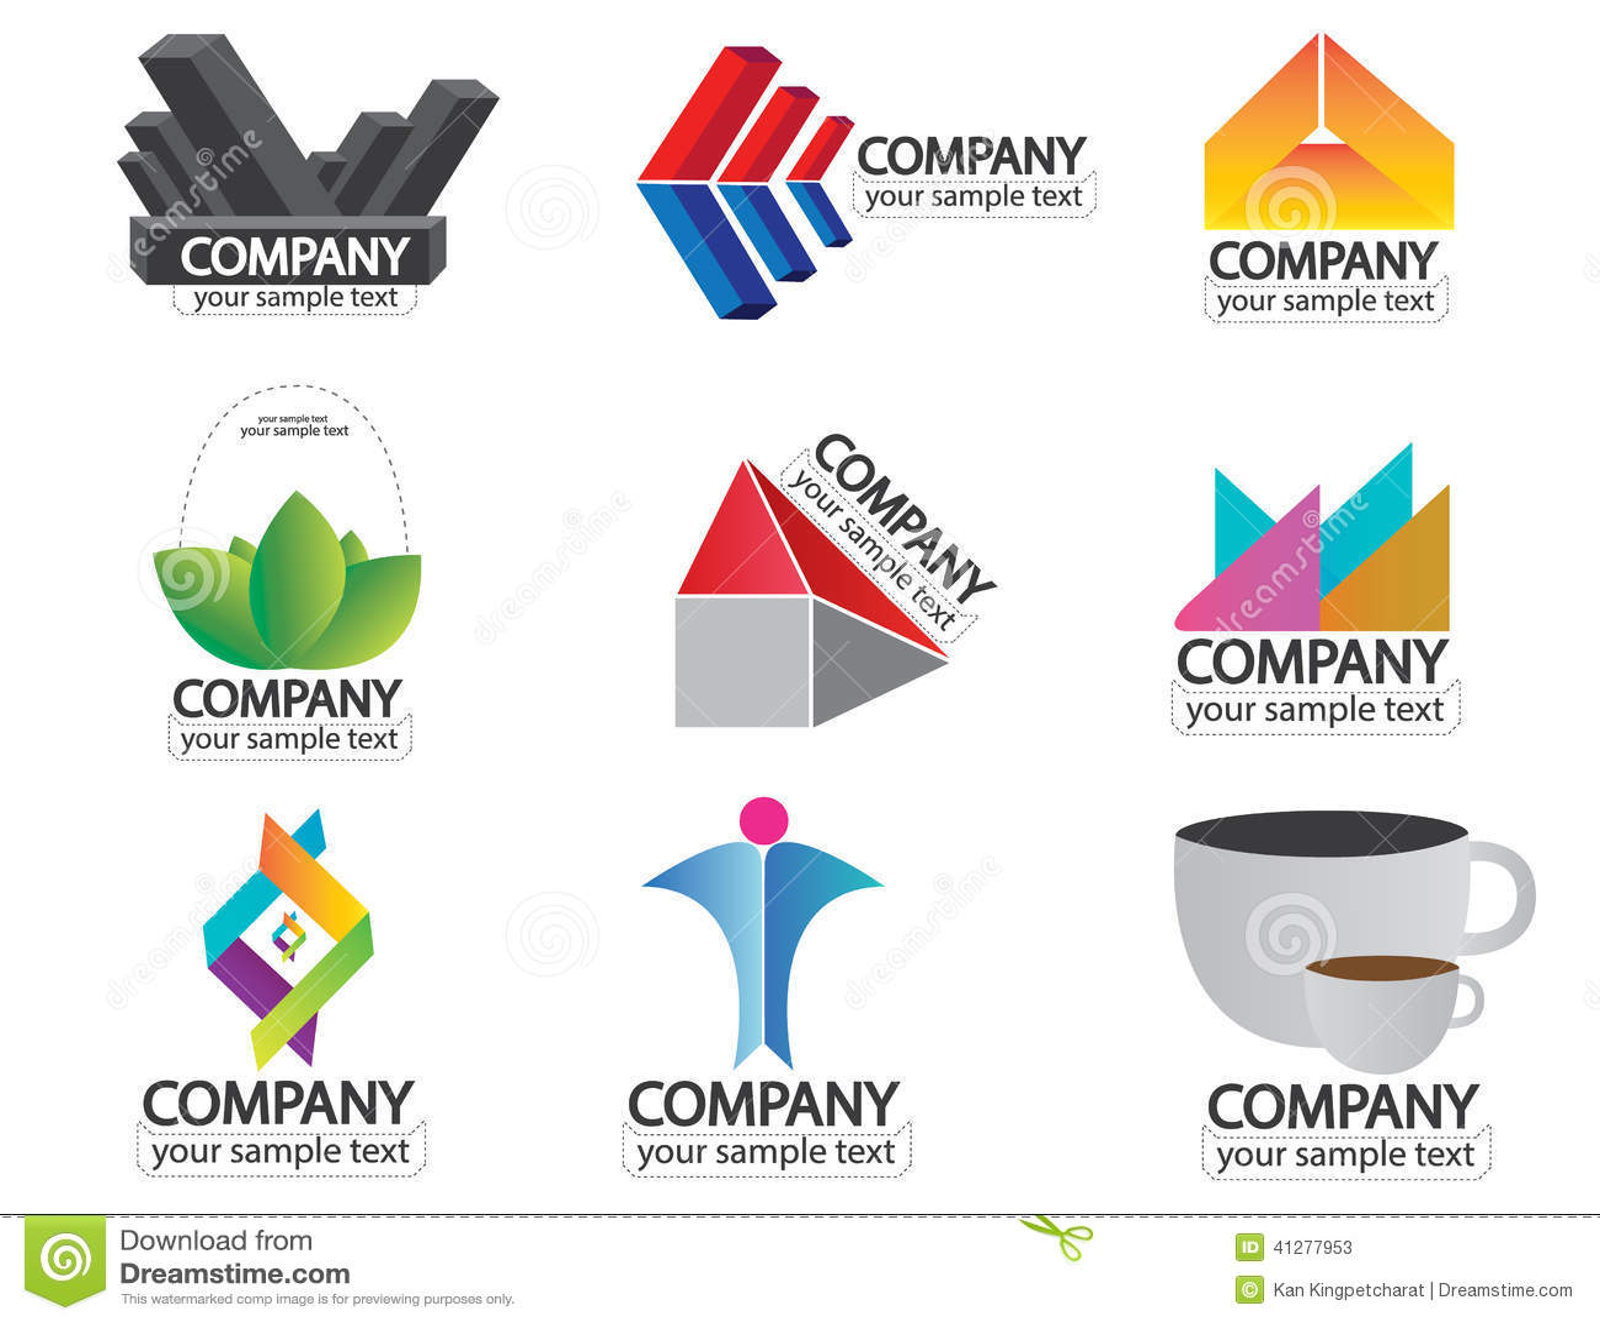 Set Of Company Name Logo Vector Stock Vector - Image: 41277953